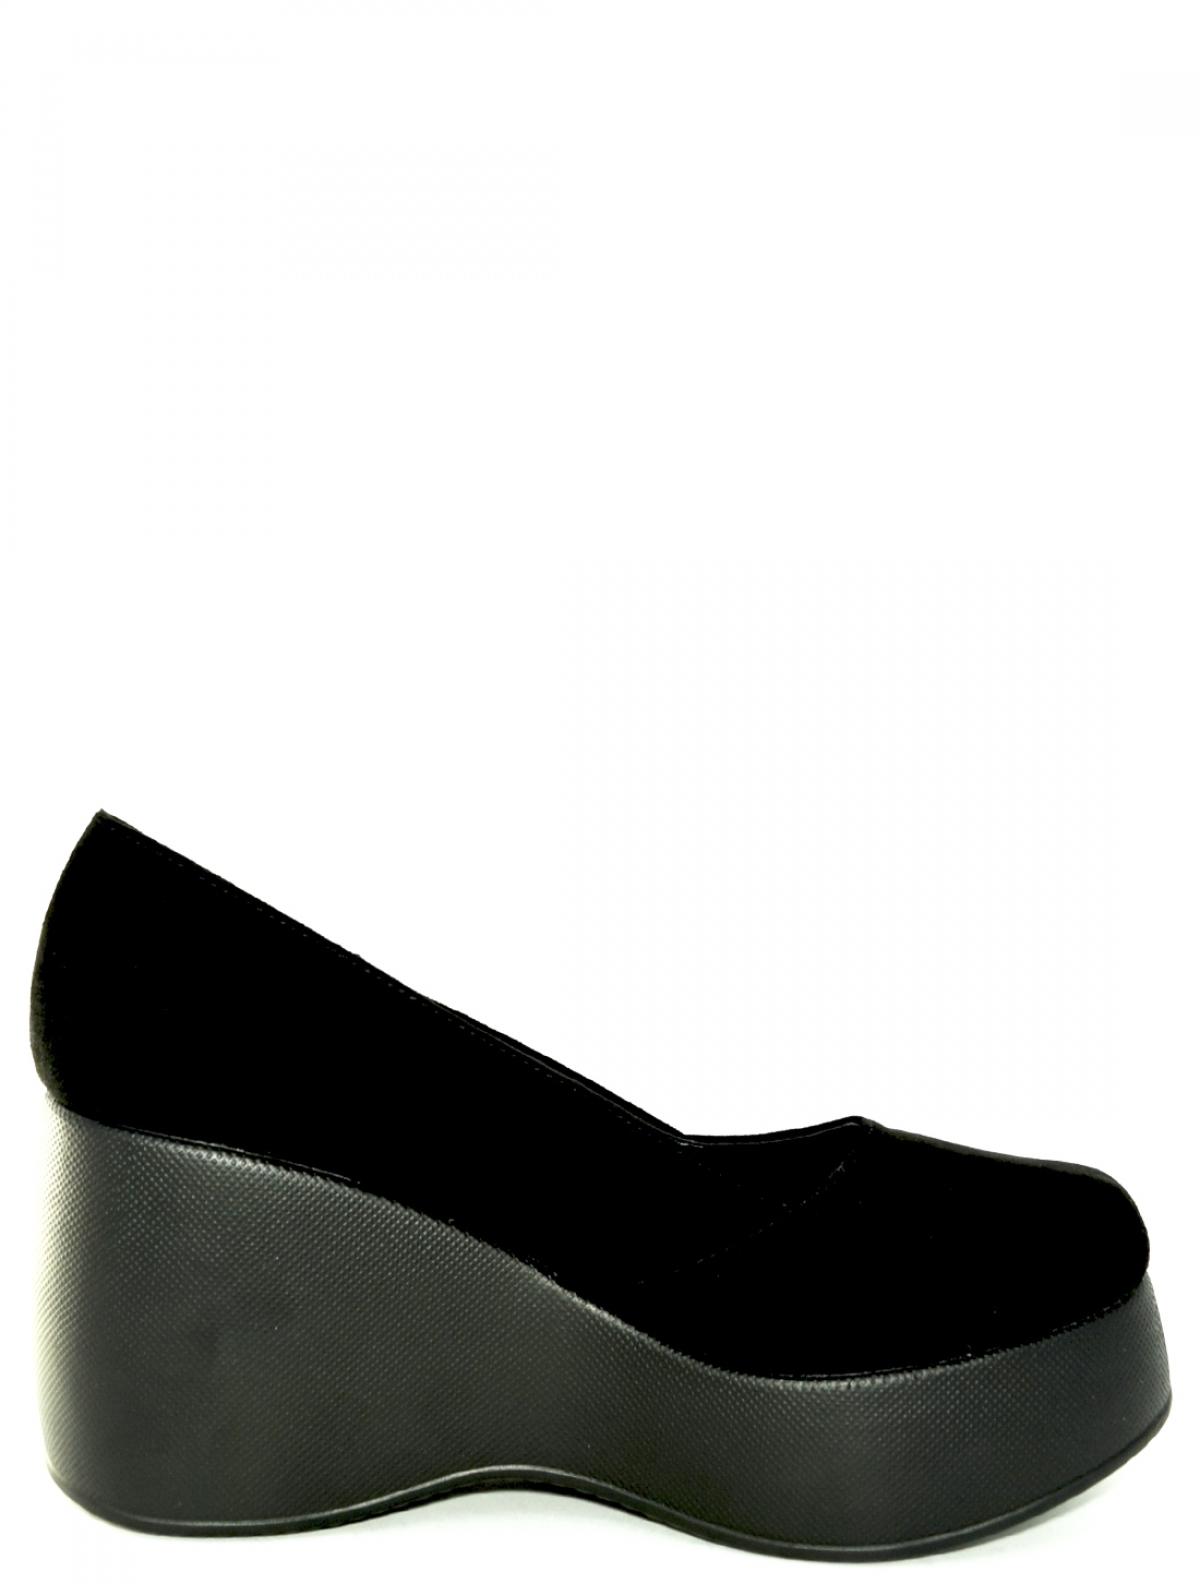 Admlis M573 женские туфли